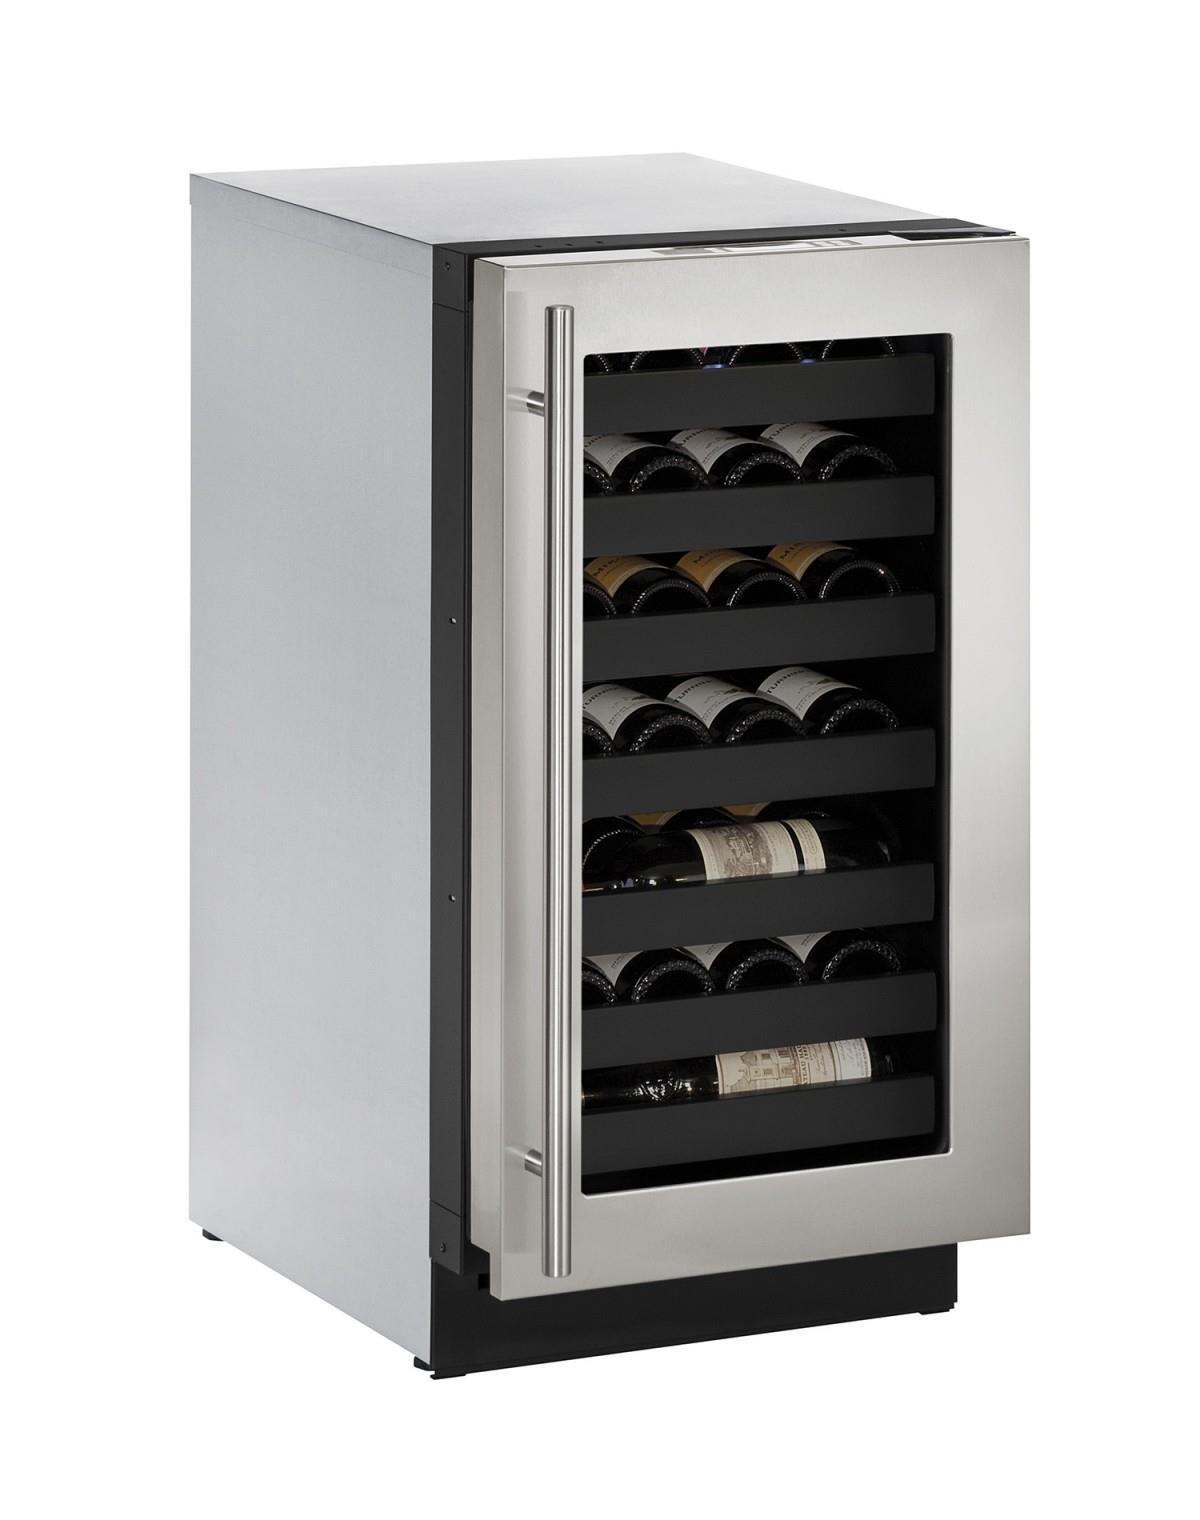 "U-Line Wine Captains 3.6 Cu. Ft. 18"" Built-In Wine Storage - Item Number: U-3018WCS-00A"